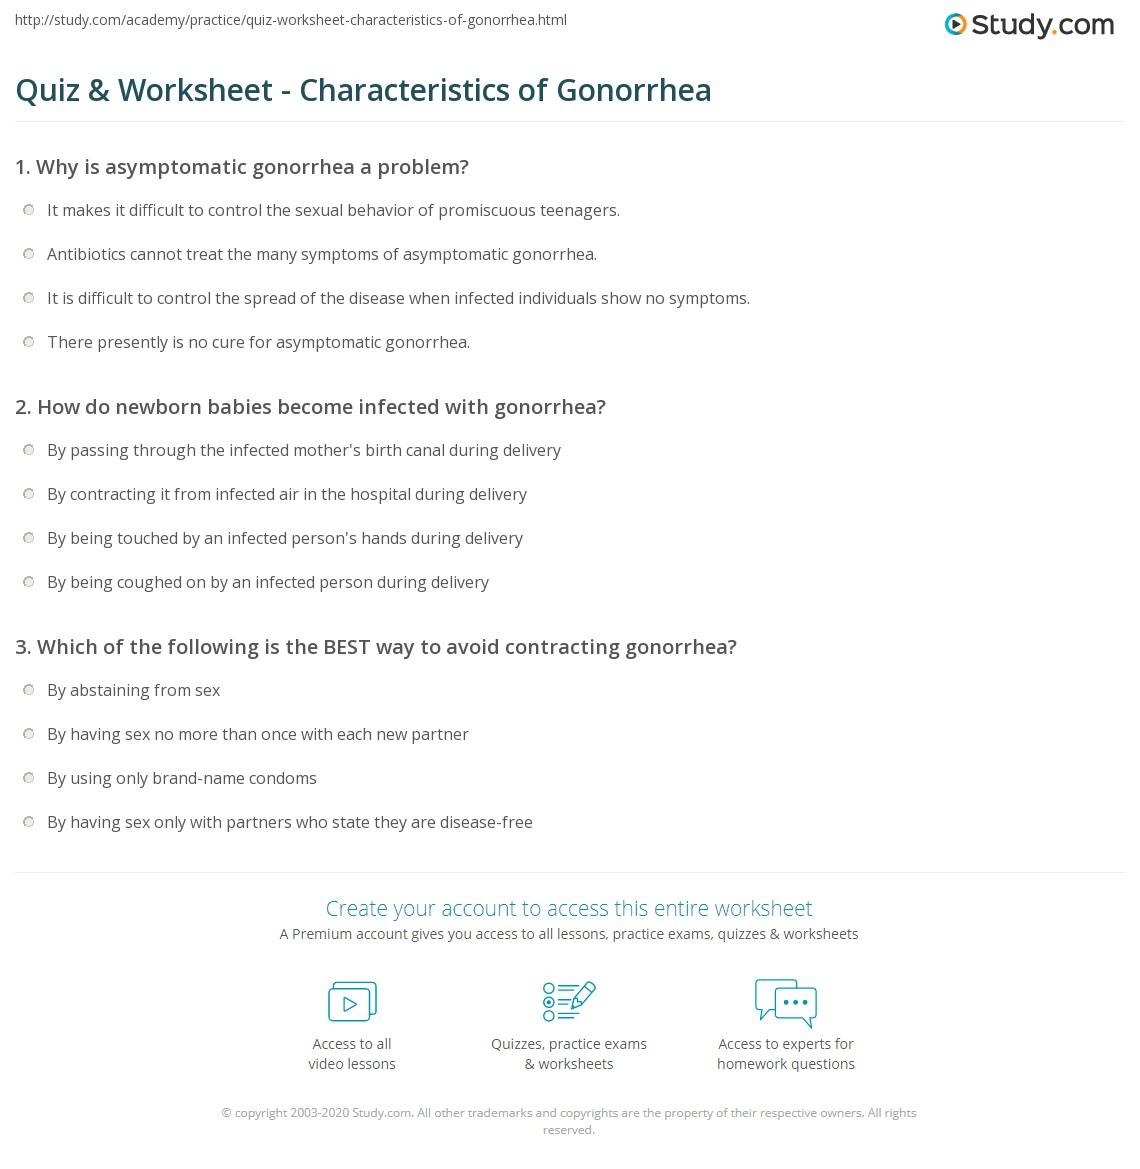 Quiz & Worksheet - Characteristics of Gonorrhea   Study com